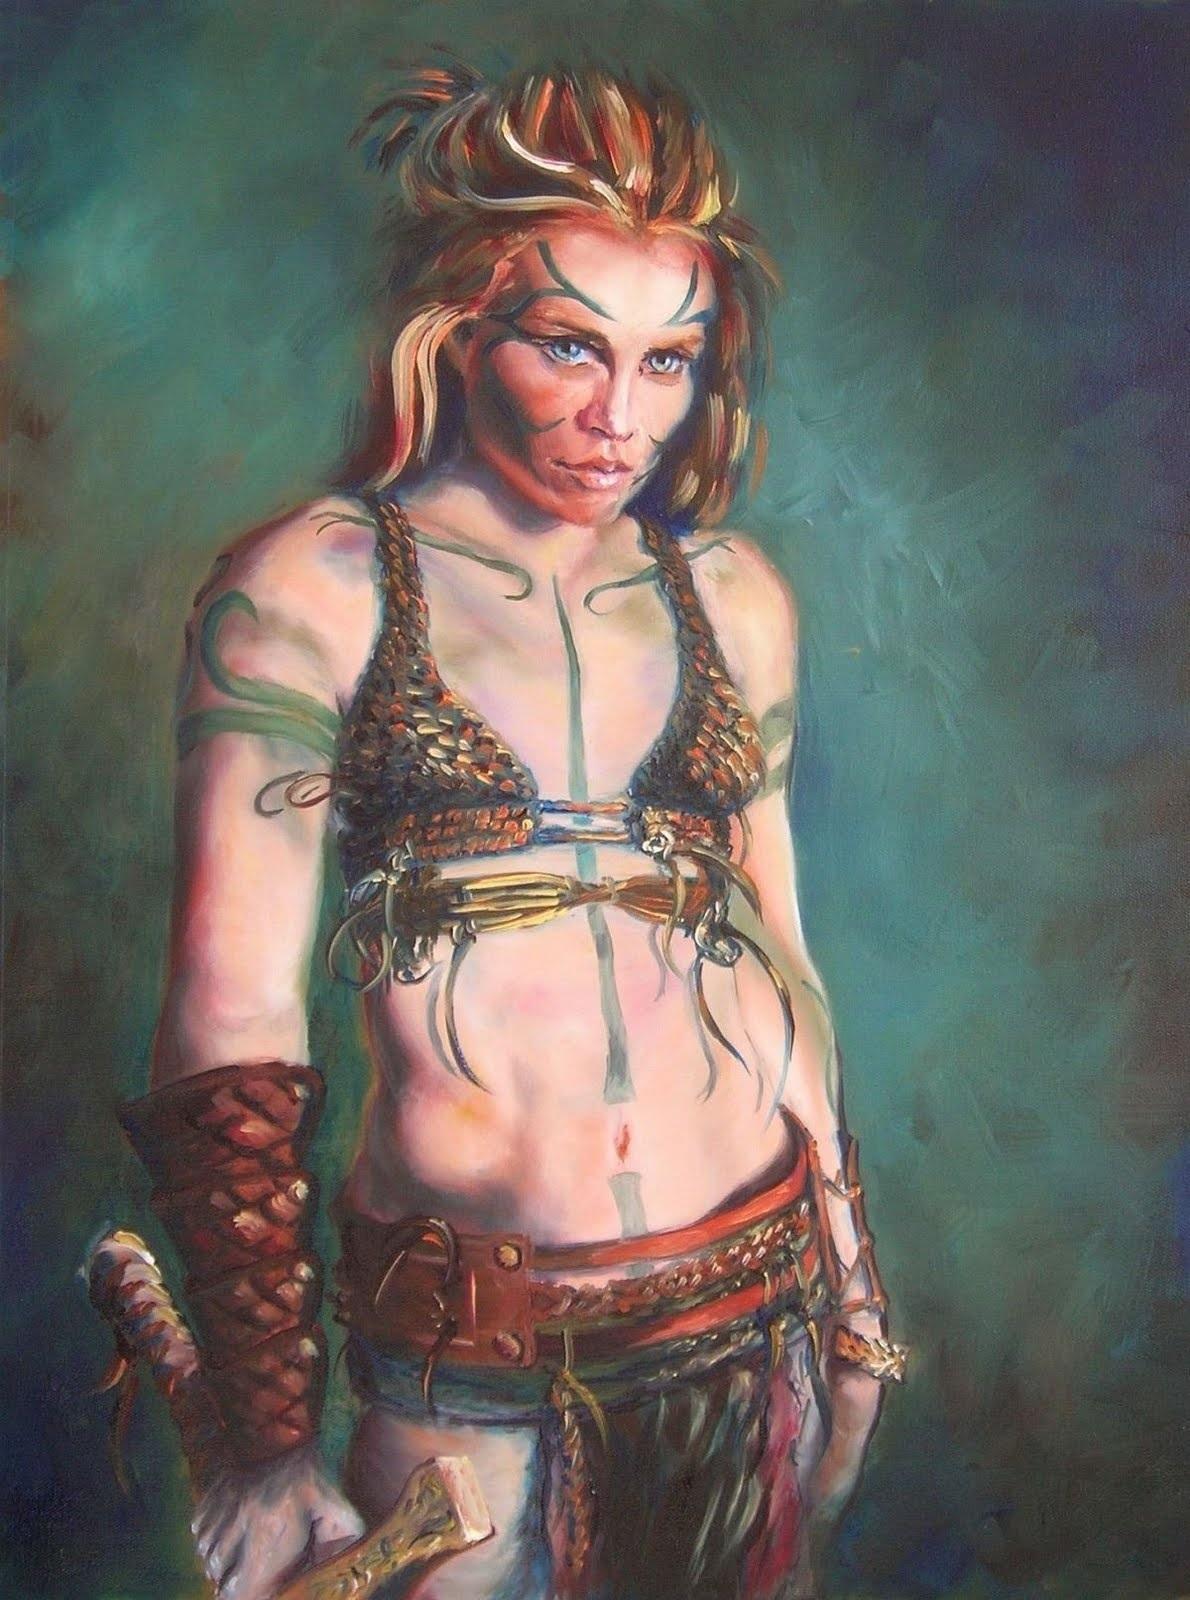 4515fdfab Celtic Warrior Woman Sword And Armor Tattoos | Tattoo Photo ...